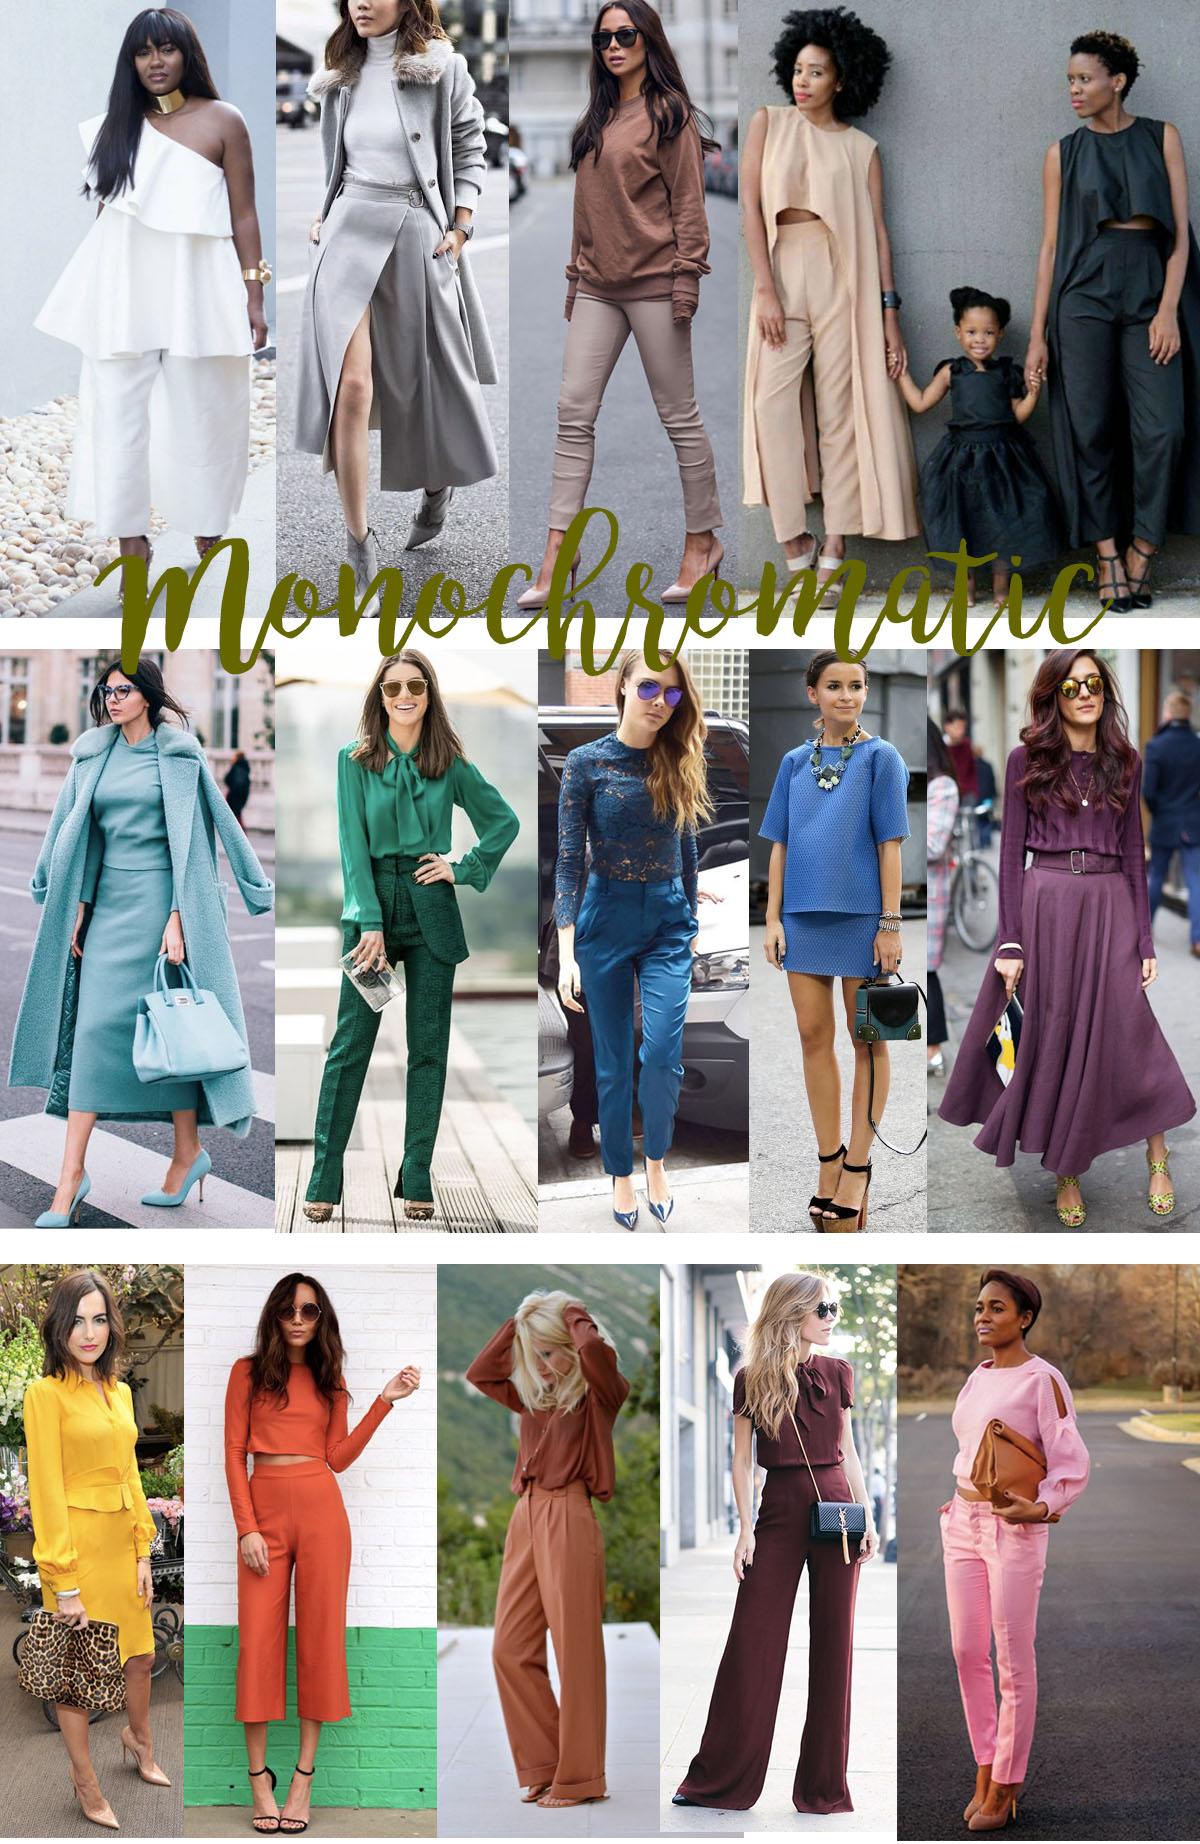 monochromatic-outfit-ideas.jpg